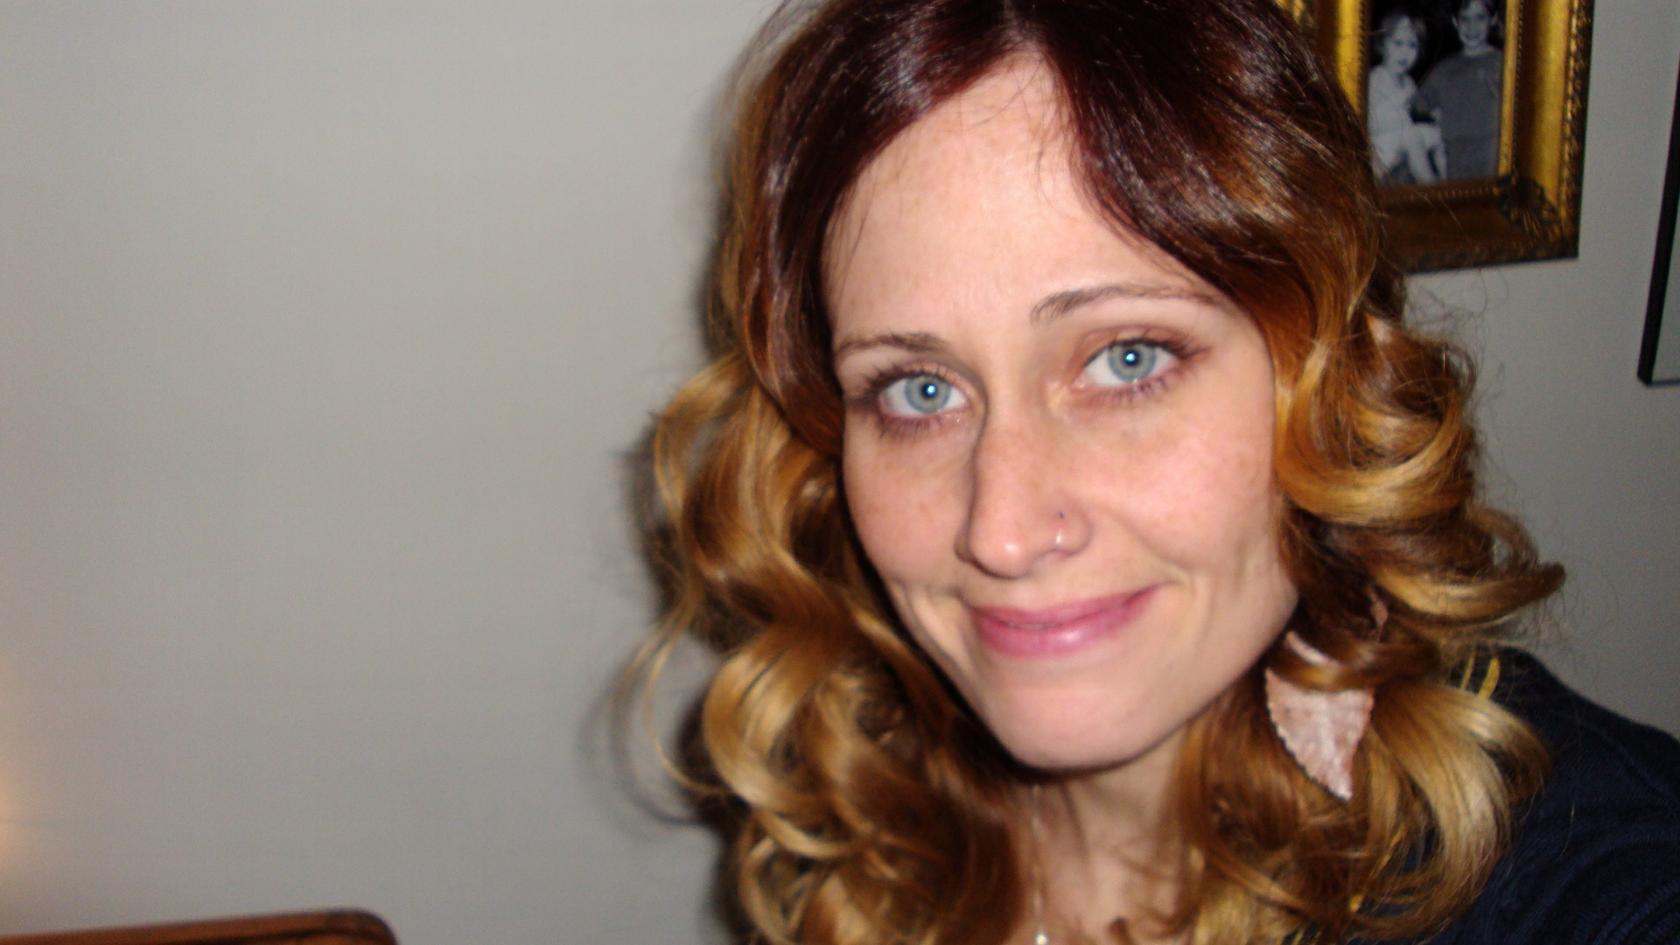 Danielle Bennett